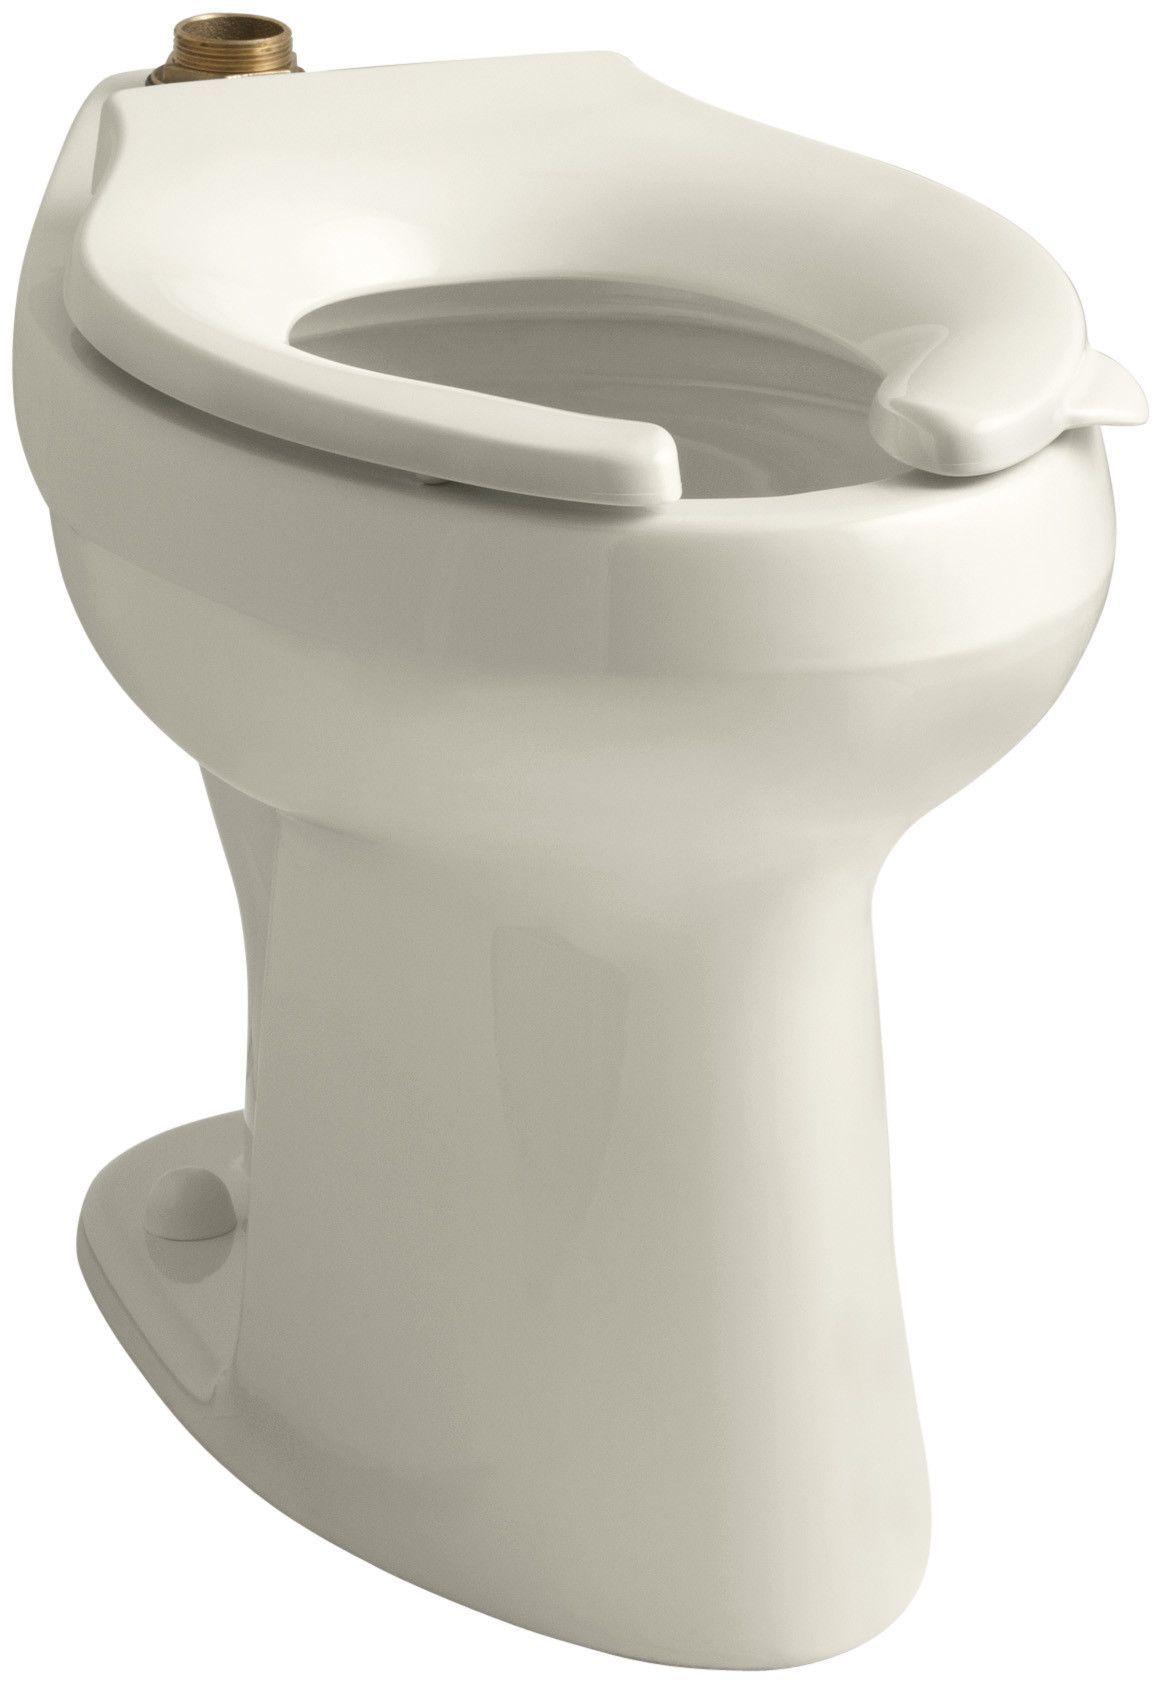 Battery Backup Toilet Bowl Contemporary Toilets Toilet